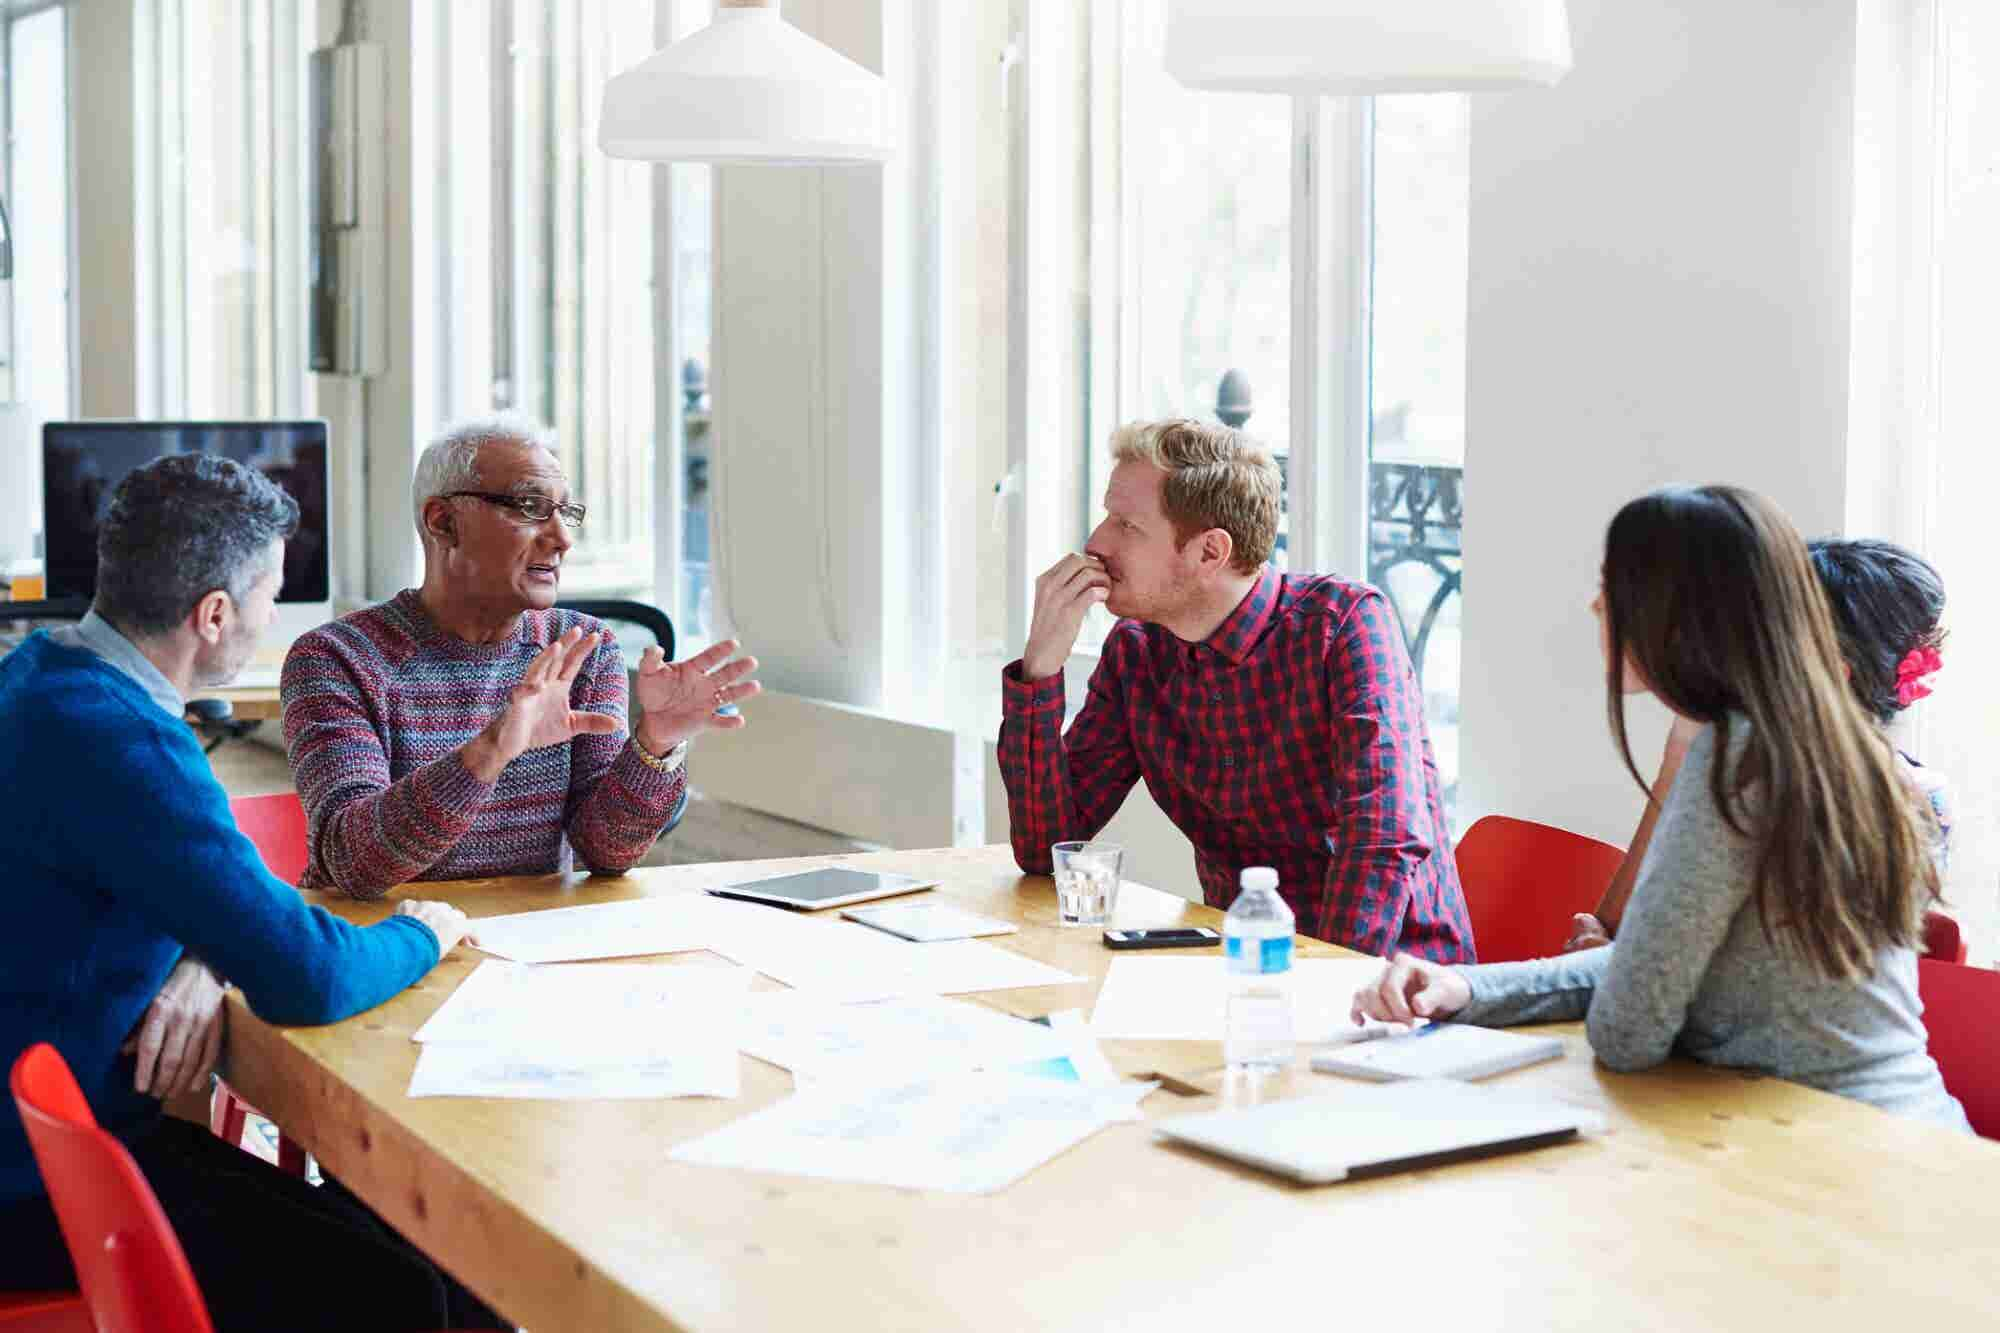 5 Steps to Handling a Crisis Like a Boss